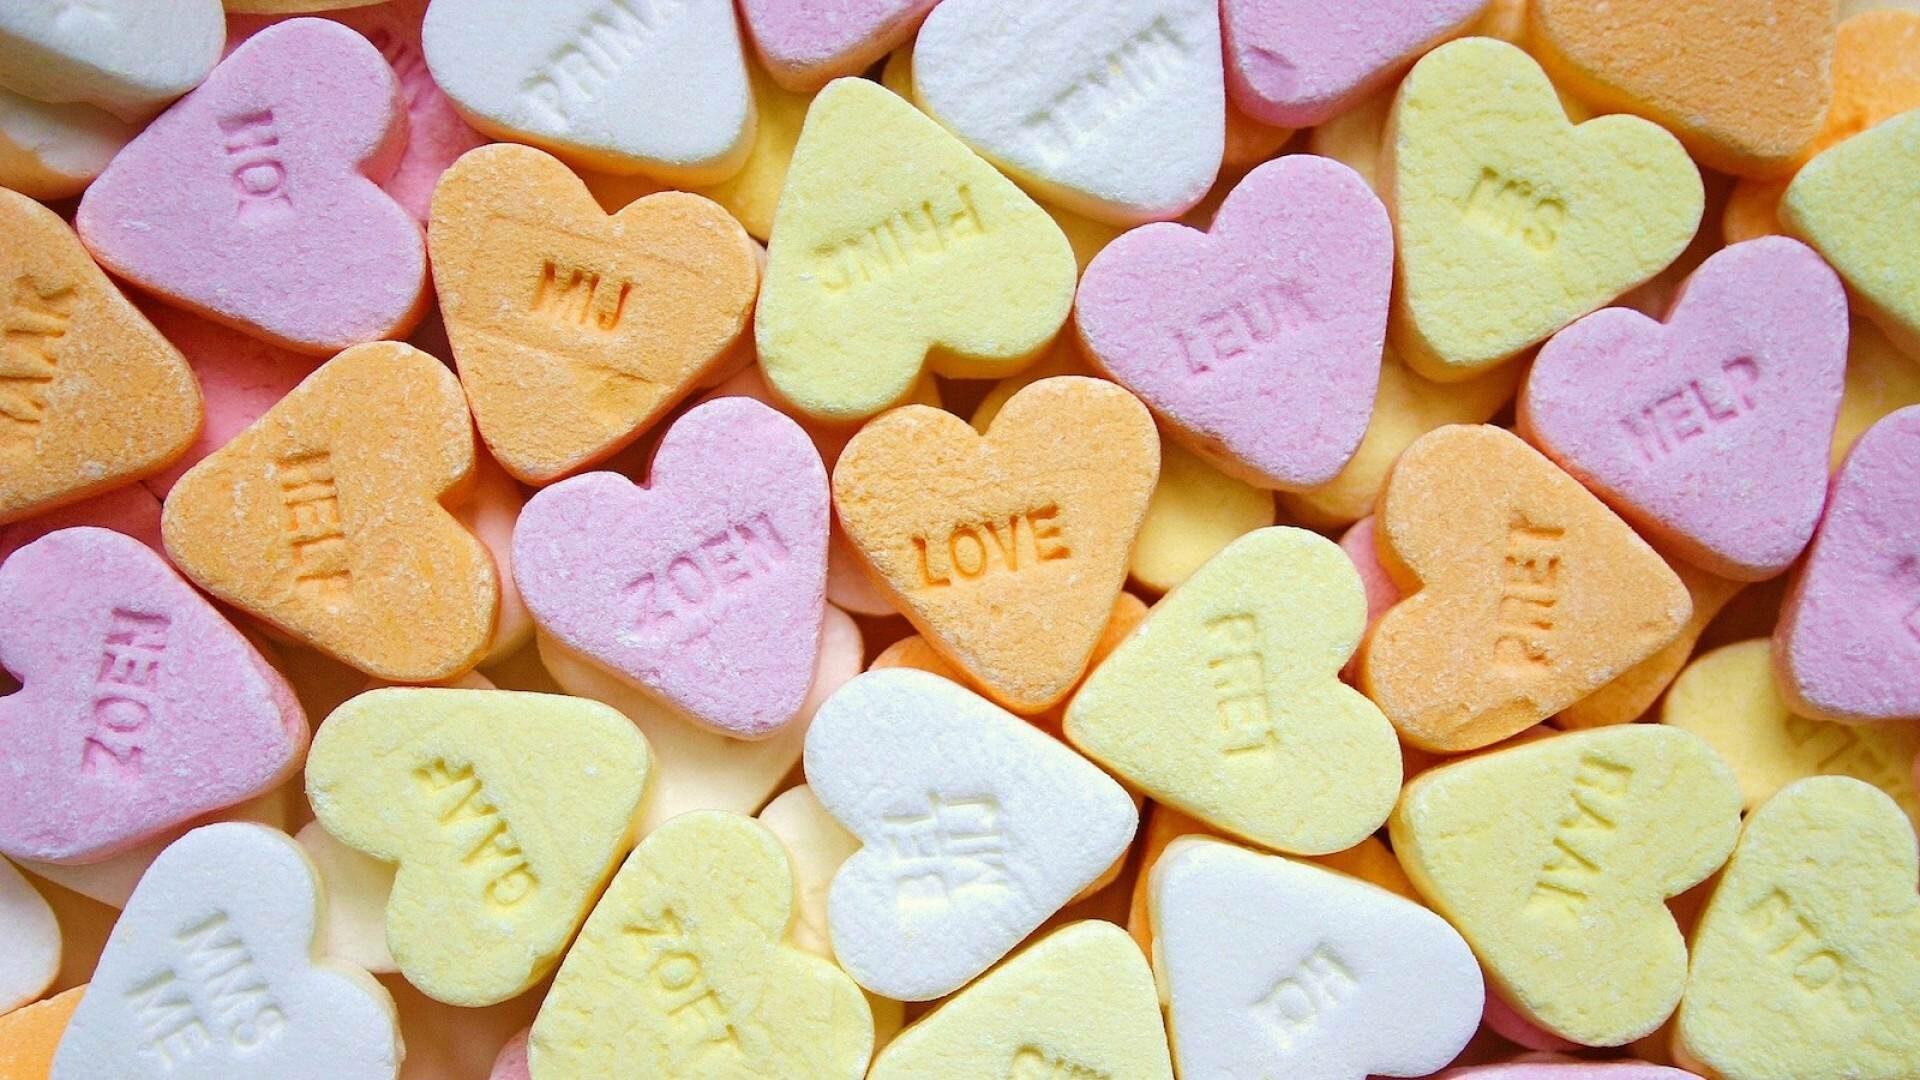 Roze Valentijnsviering